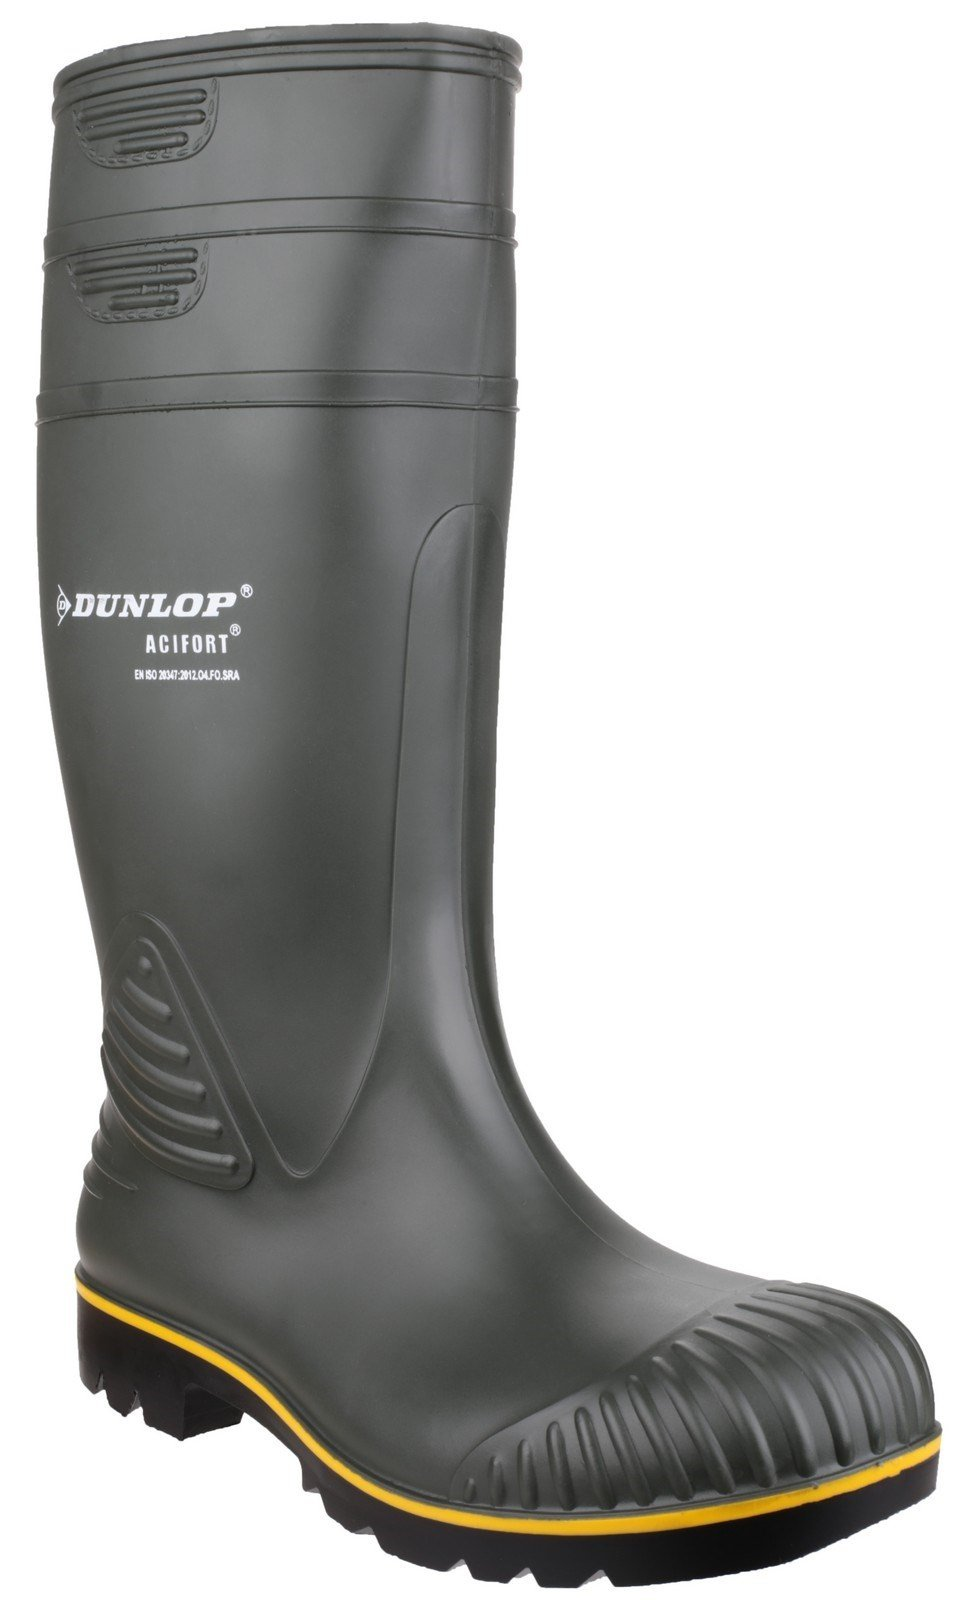 Dunlop Unisex Acifort Heavy Duty Non Safety Wellington Boot Green 22711 - Green 6.5